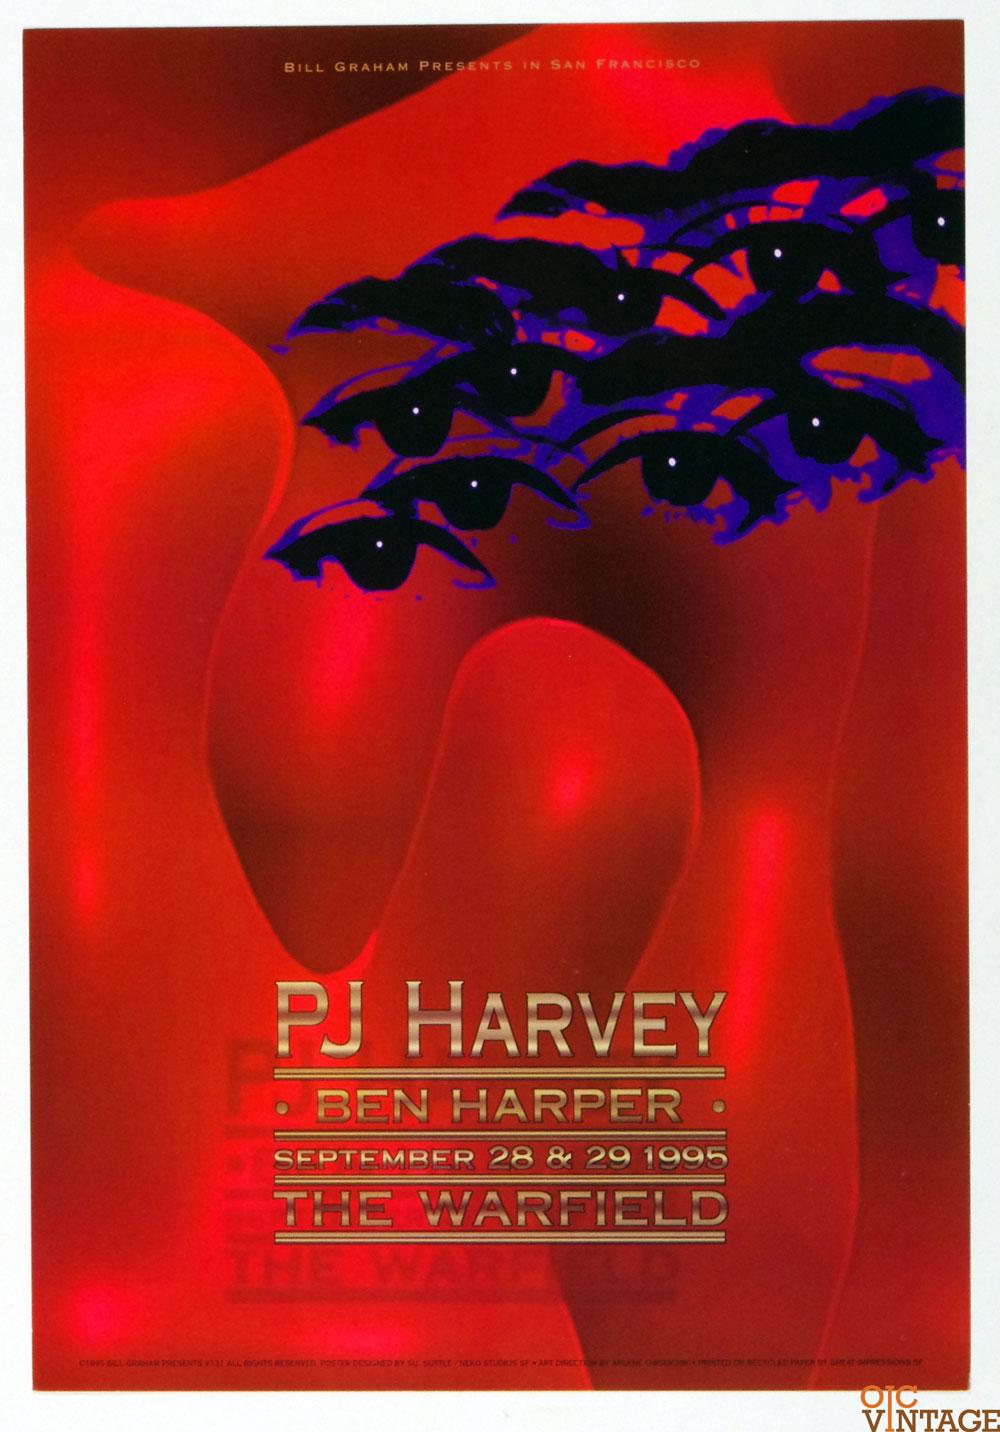 Bill Graham Presents Poster 1995 Sep 28 PJ Harvey Ben Harper #131